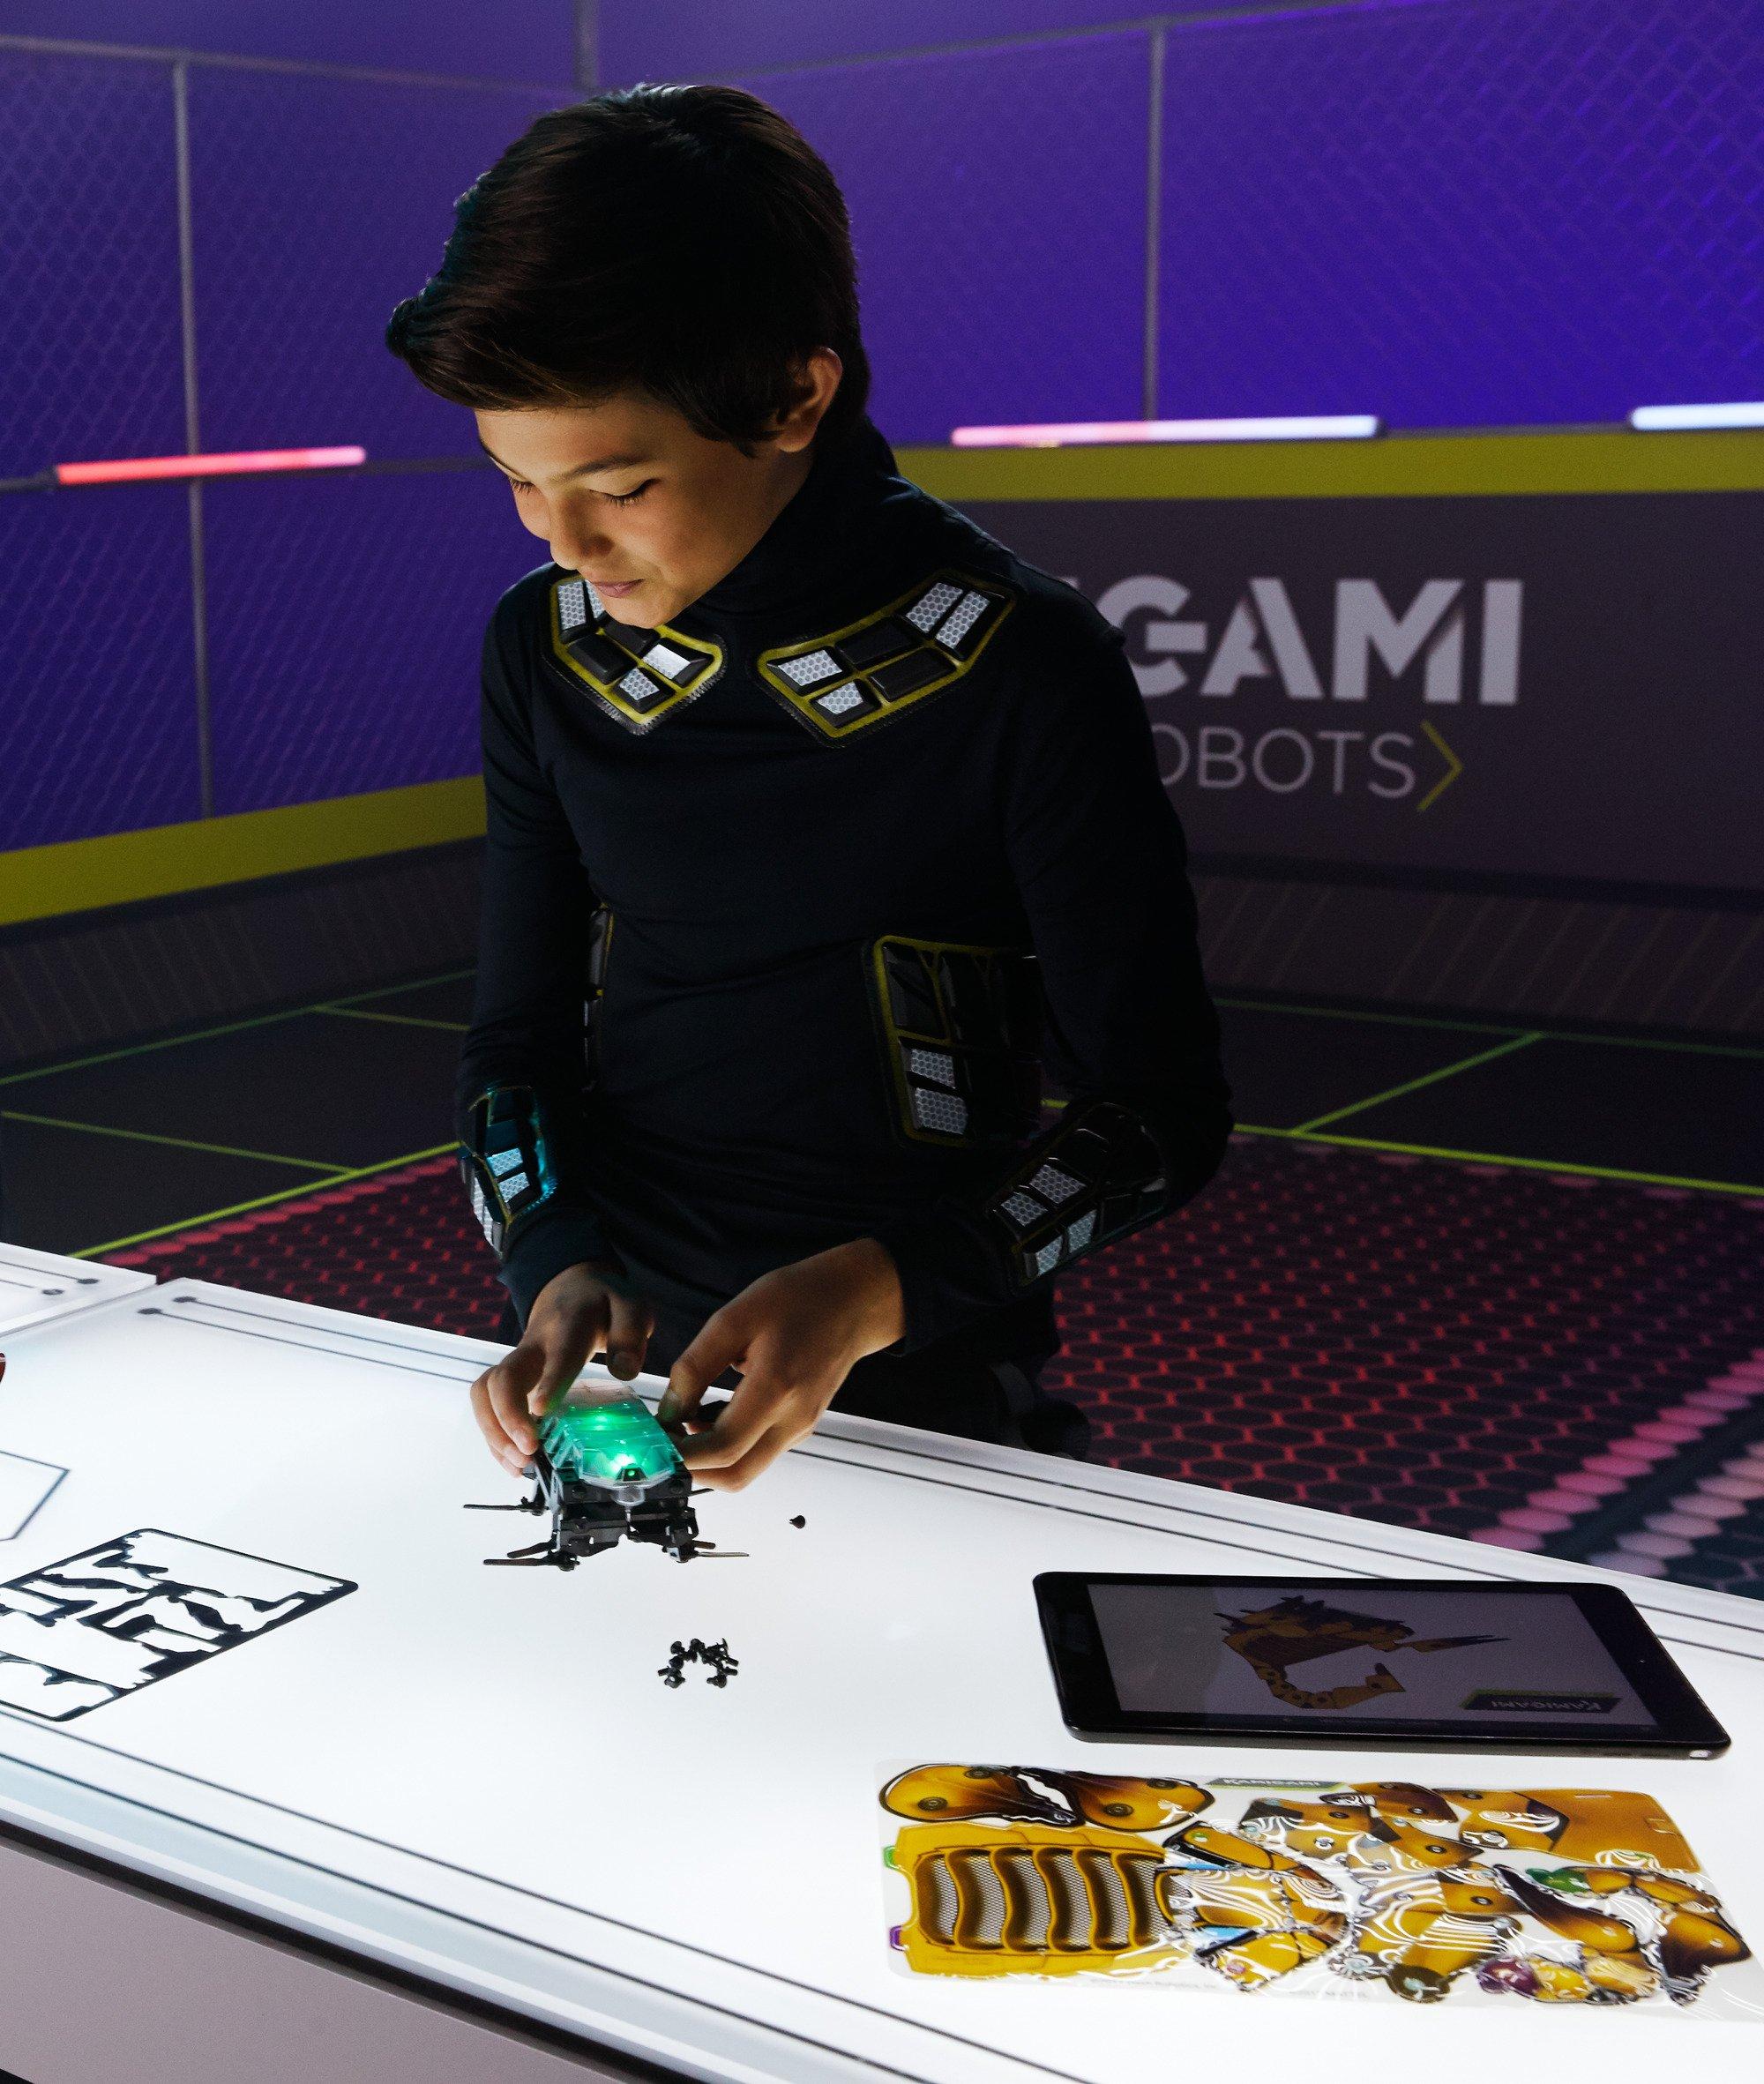 Kamigami Atlasar Robot by Mattel (Image #19)